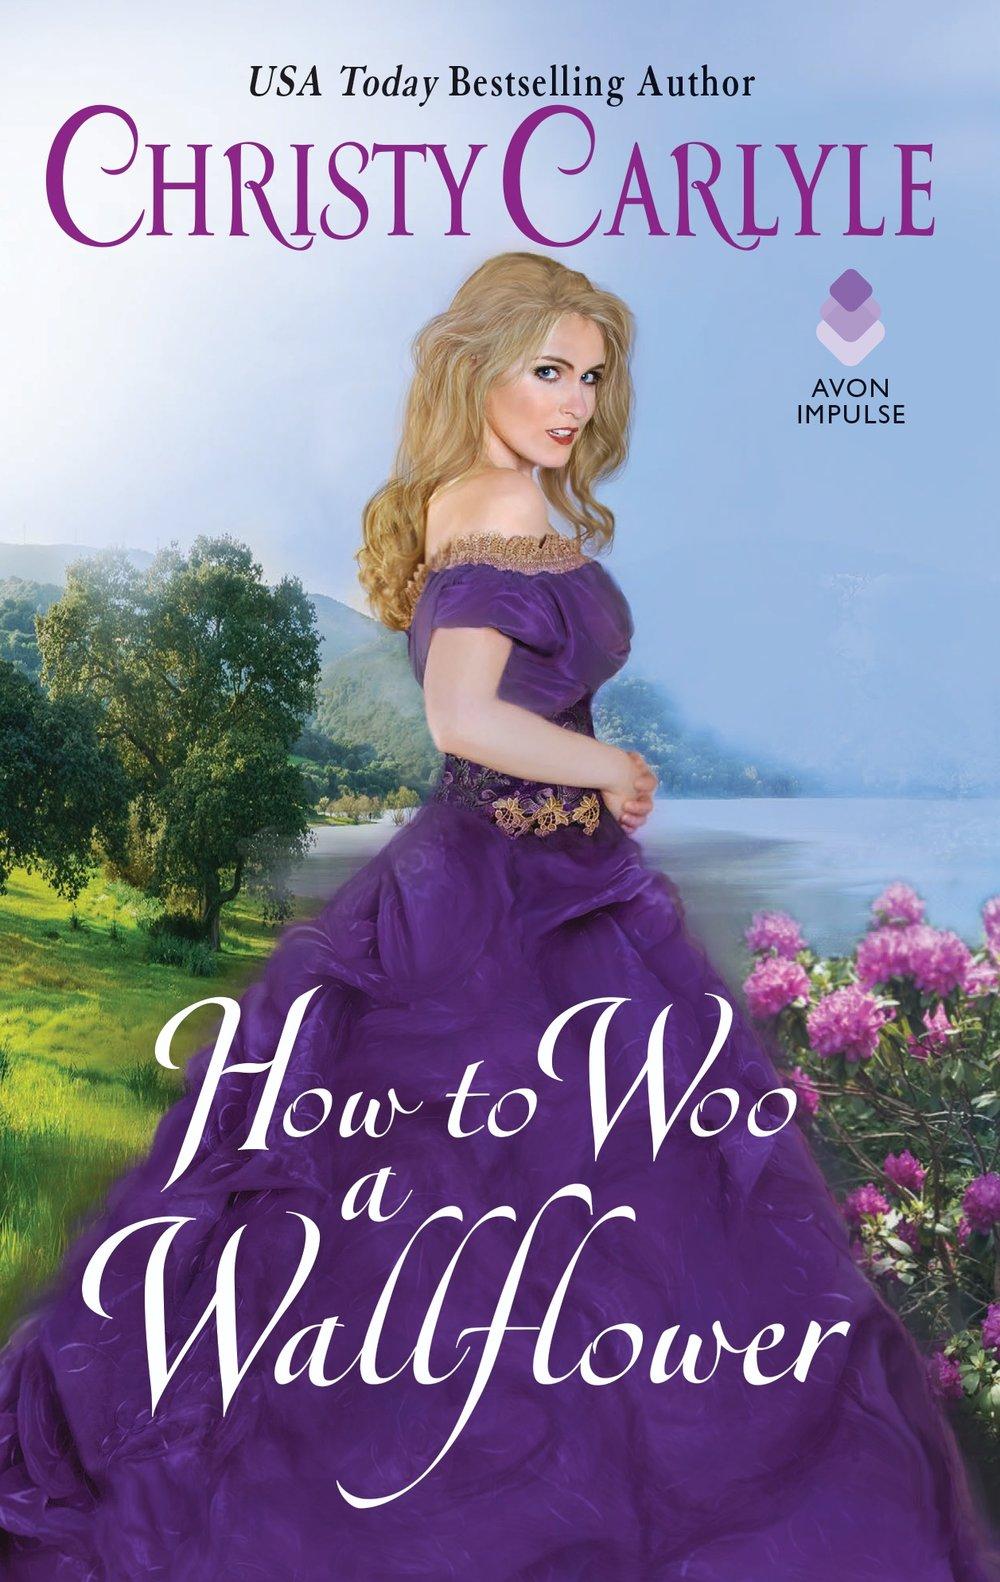 How to Woo a Wallflower.JPG